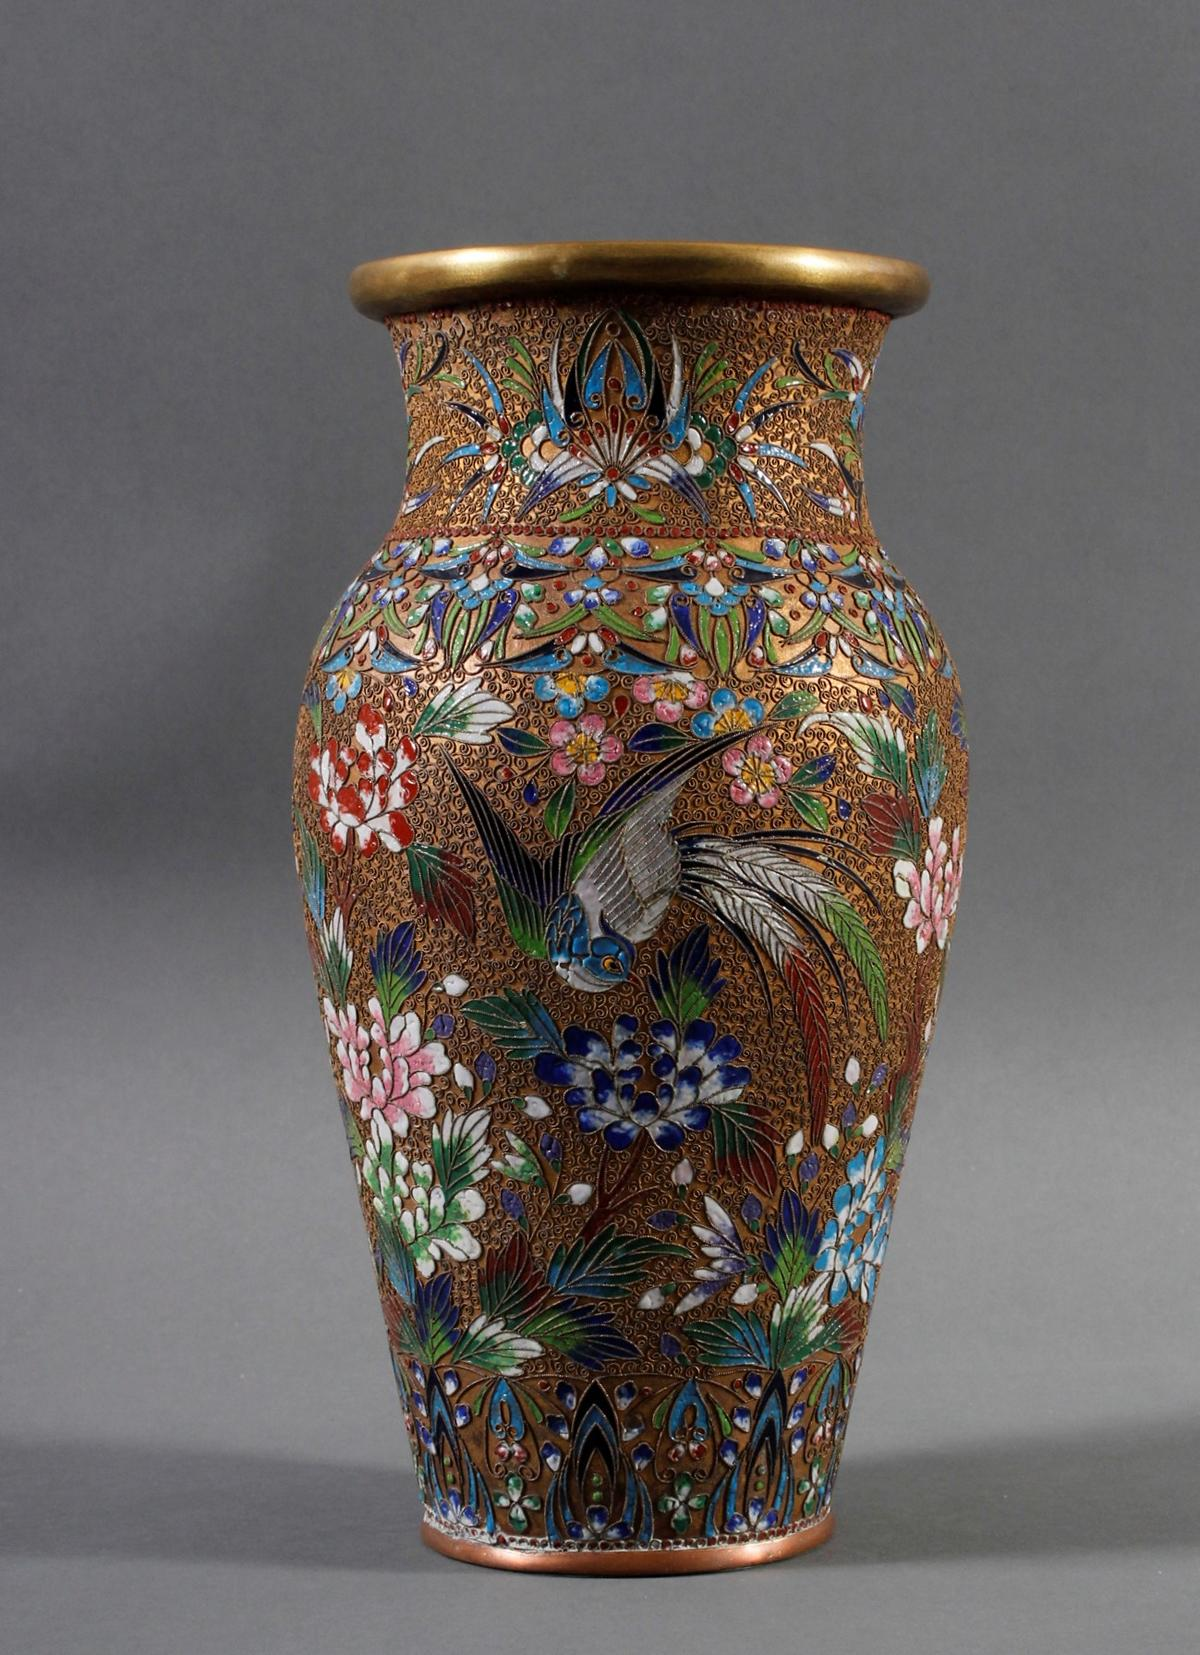 Cloisonnè Vase, China Ende 19. Jahrhundert